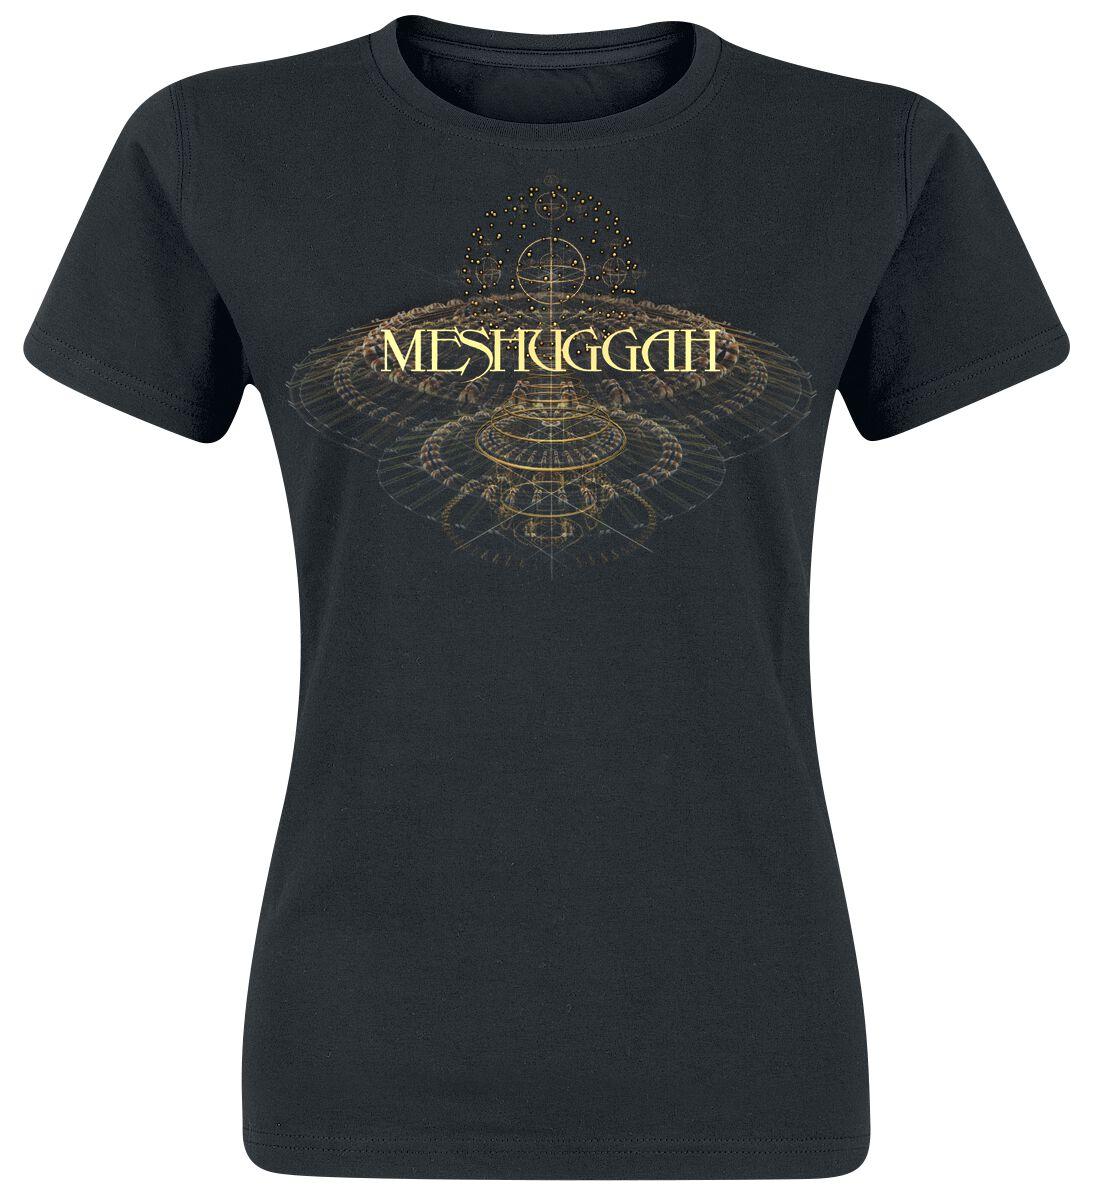 Zespoły - Koszulki - Koszulka damska Meshuggah Collider Koszulka damska czarny - 358977